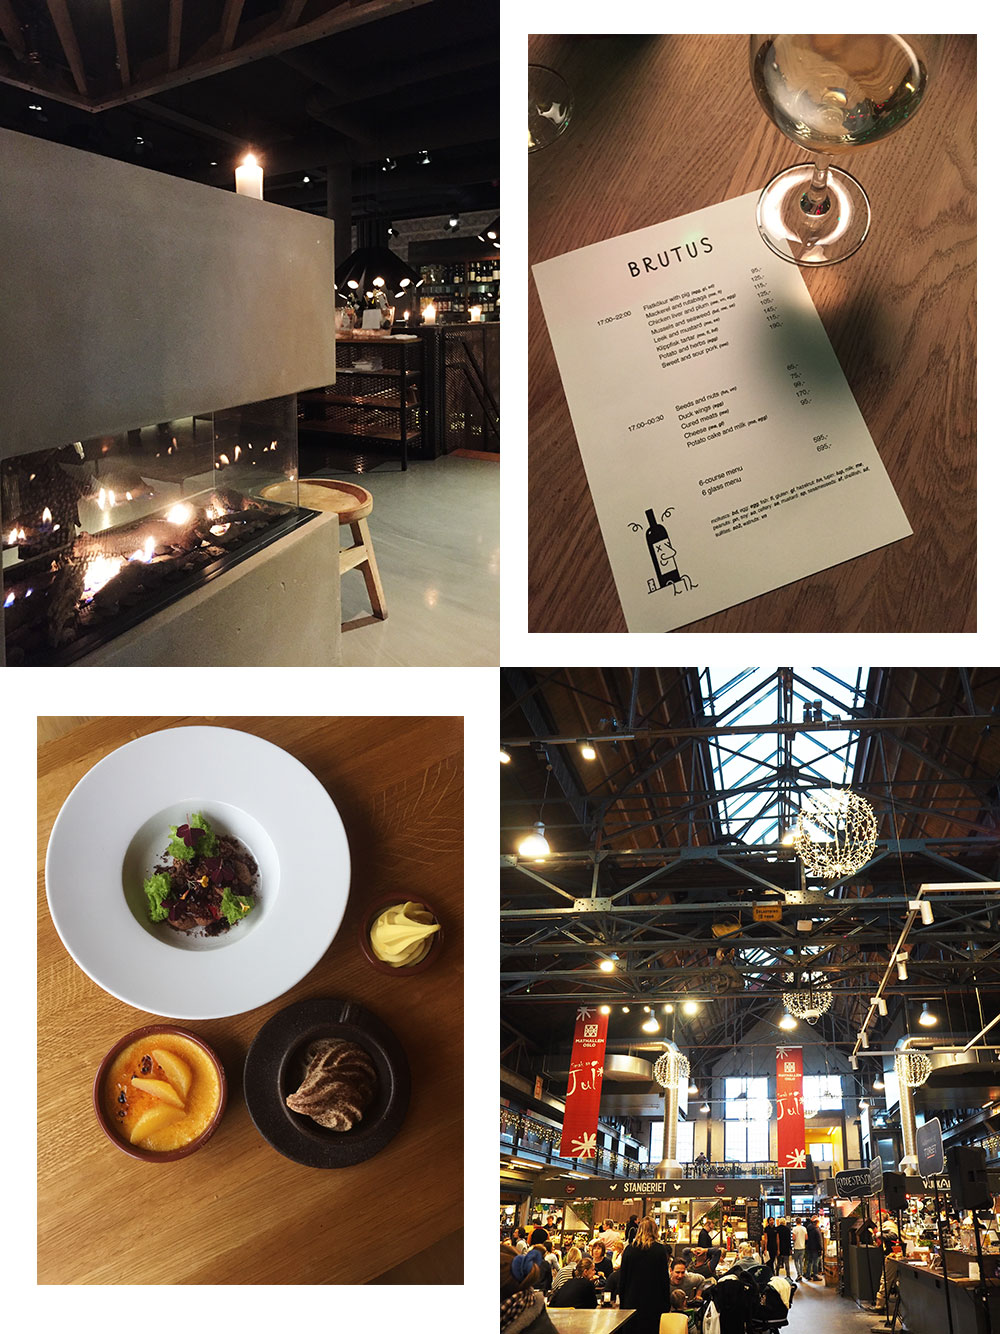 Femtastics-Oslo-Restaurants-Vaaghals-Brutus-Pila